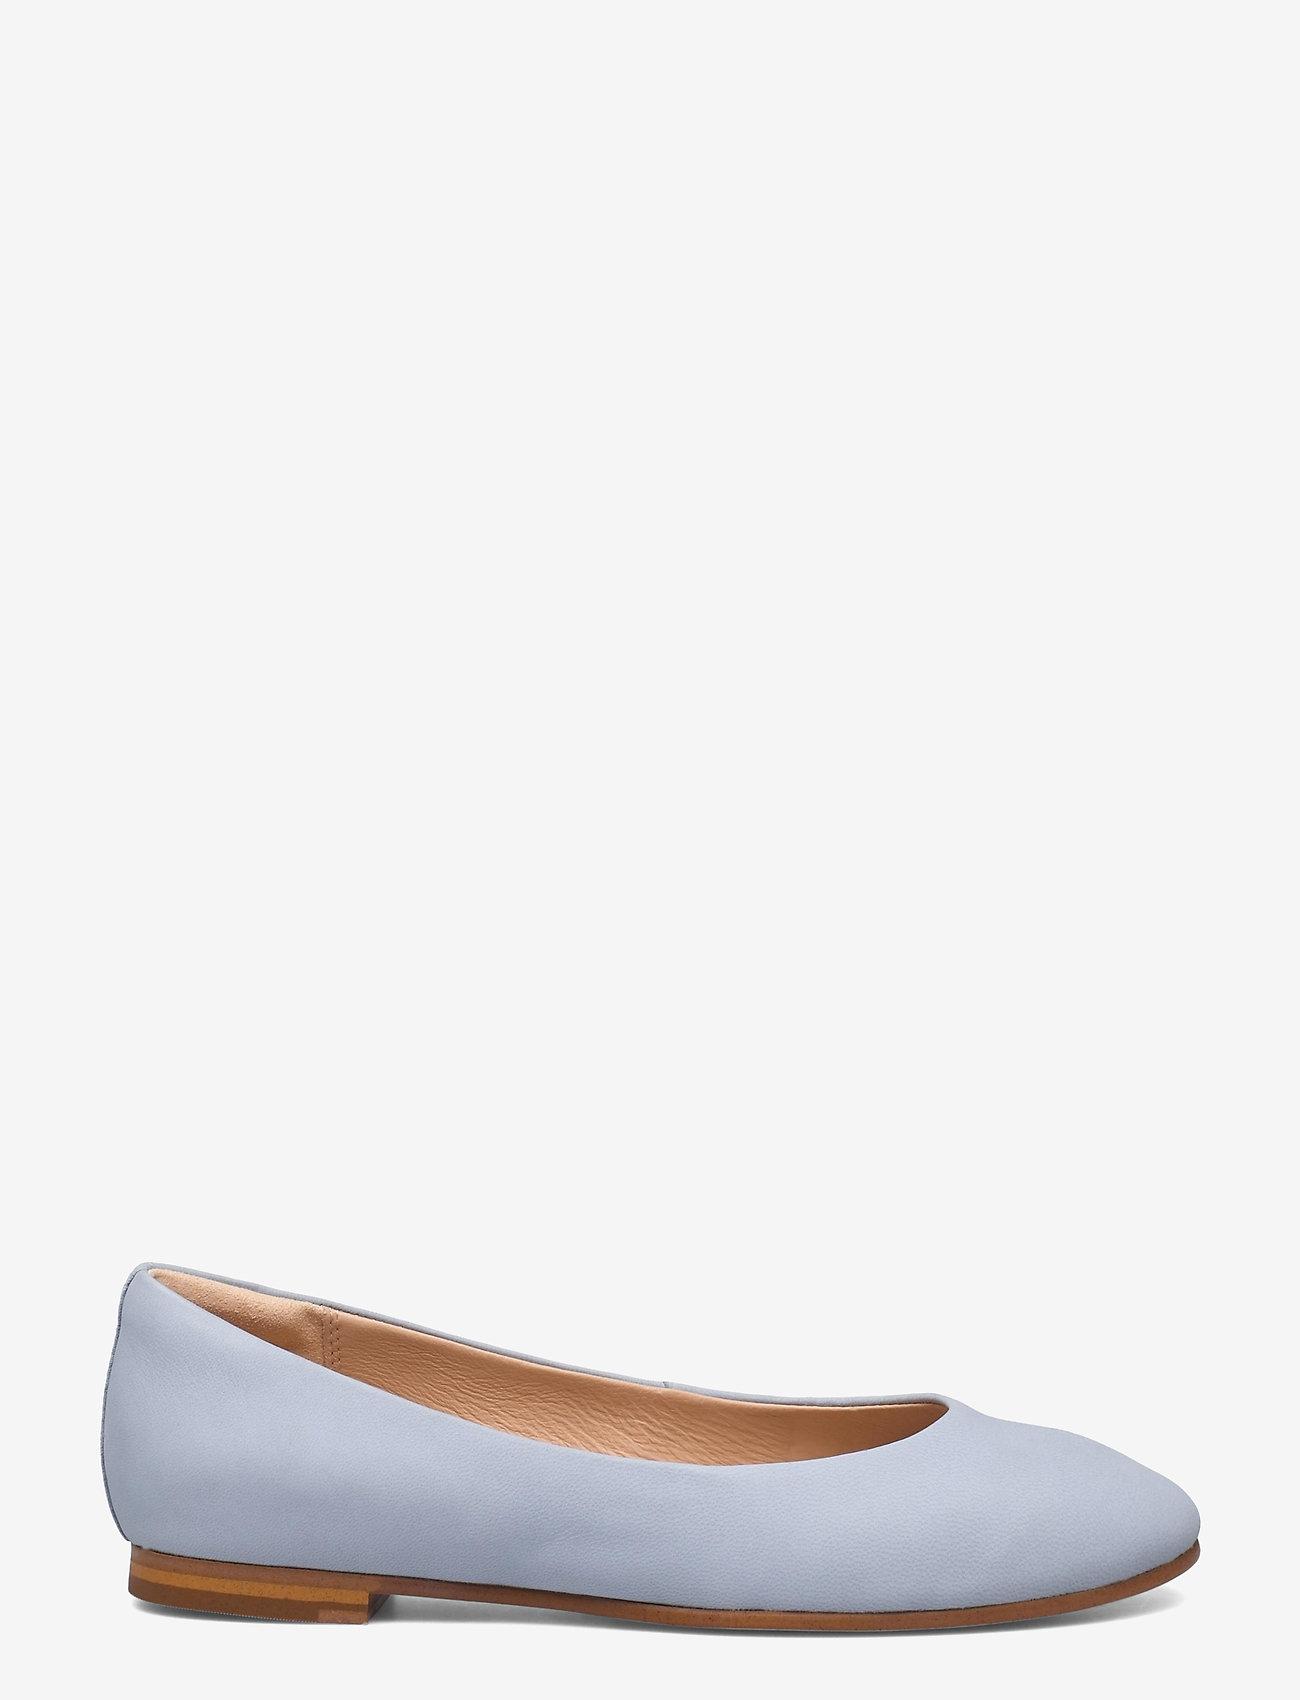 Clarks - Grace Piper - ballerinas - pale blue - 1